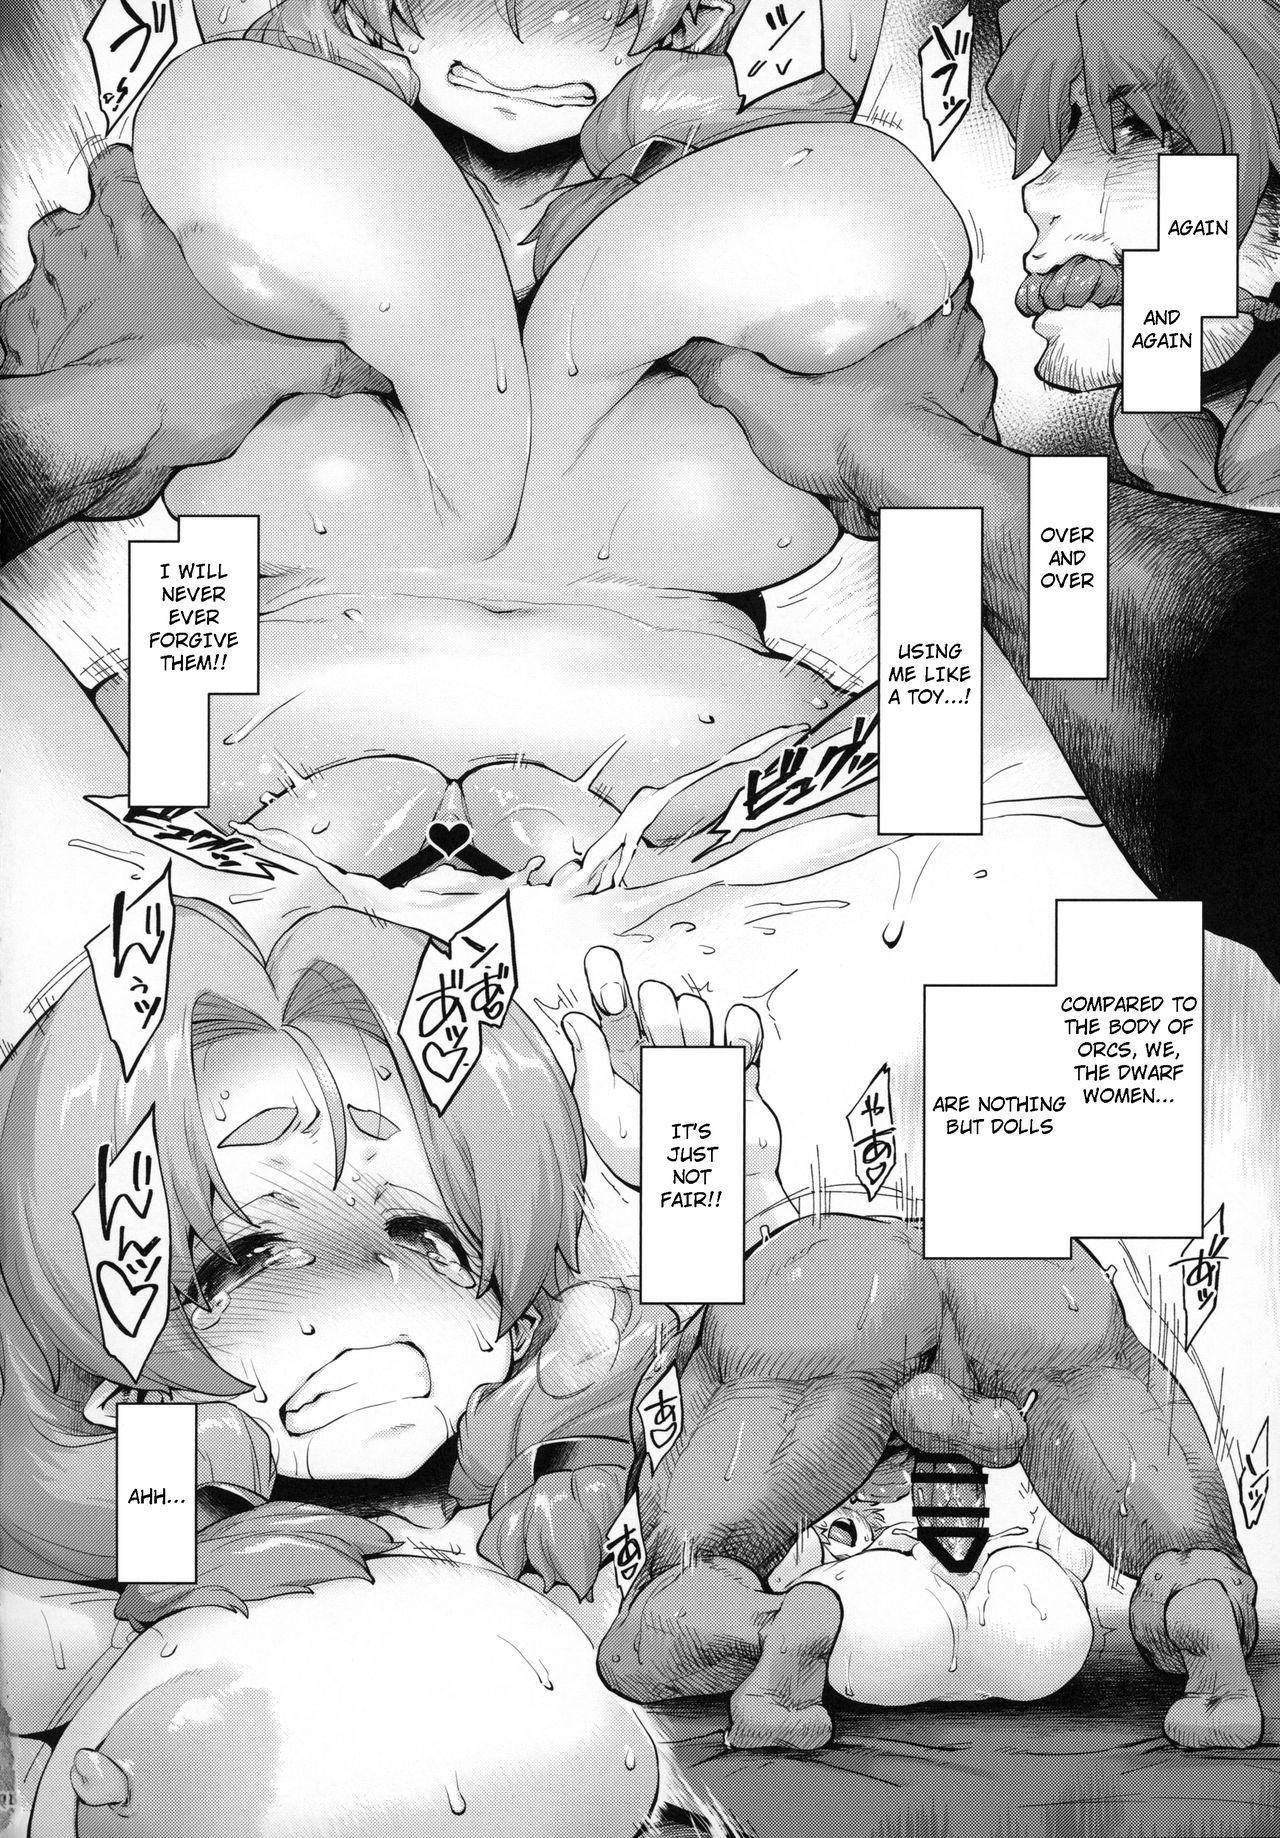 (C96) [Sago-Jou (Seura Isago)] Raiders! case:2-2 -Fallen Mountain Kingdom- [English] [PHILO] 16